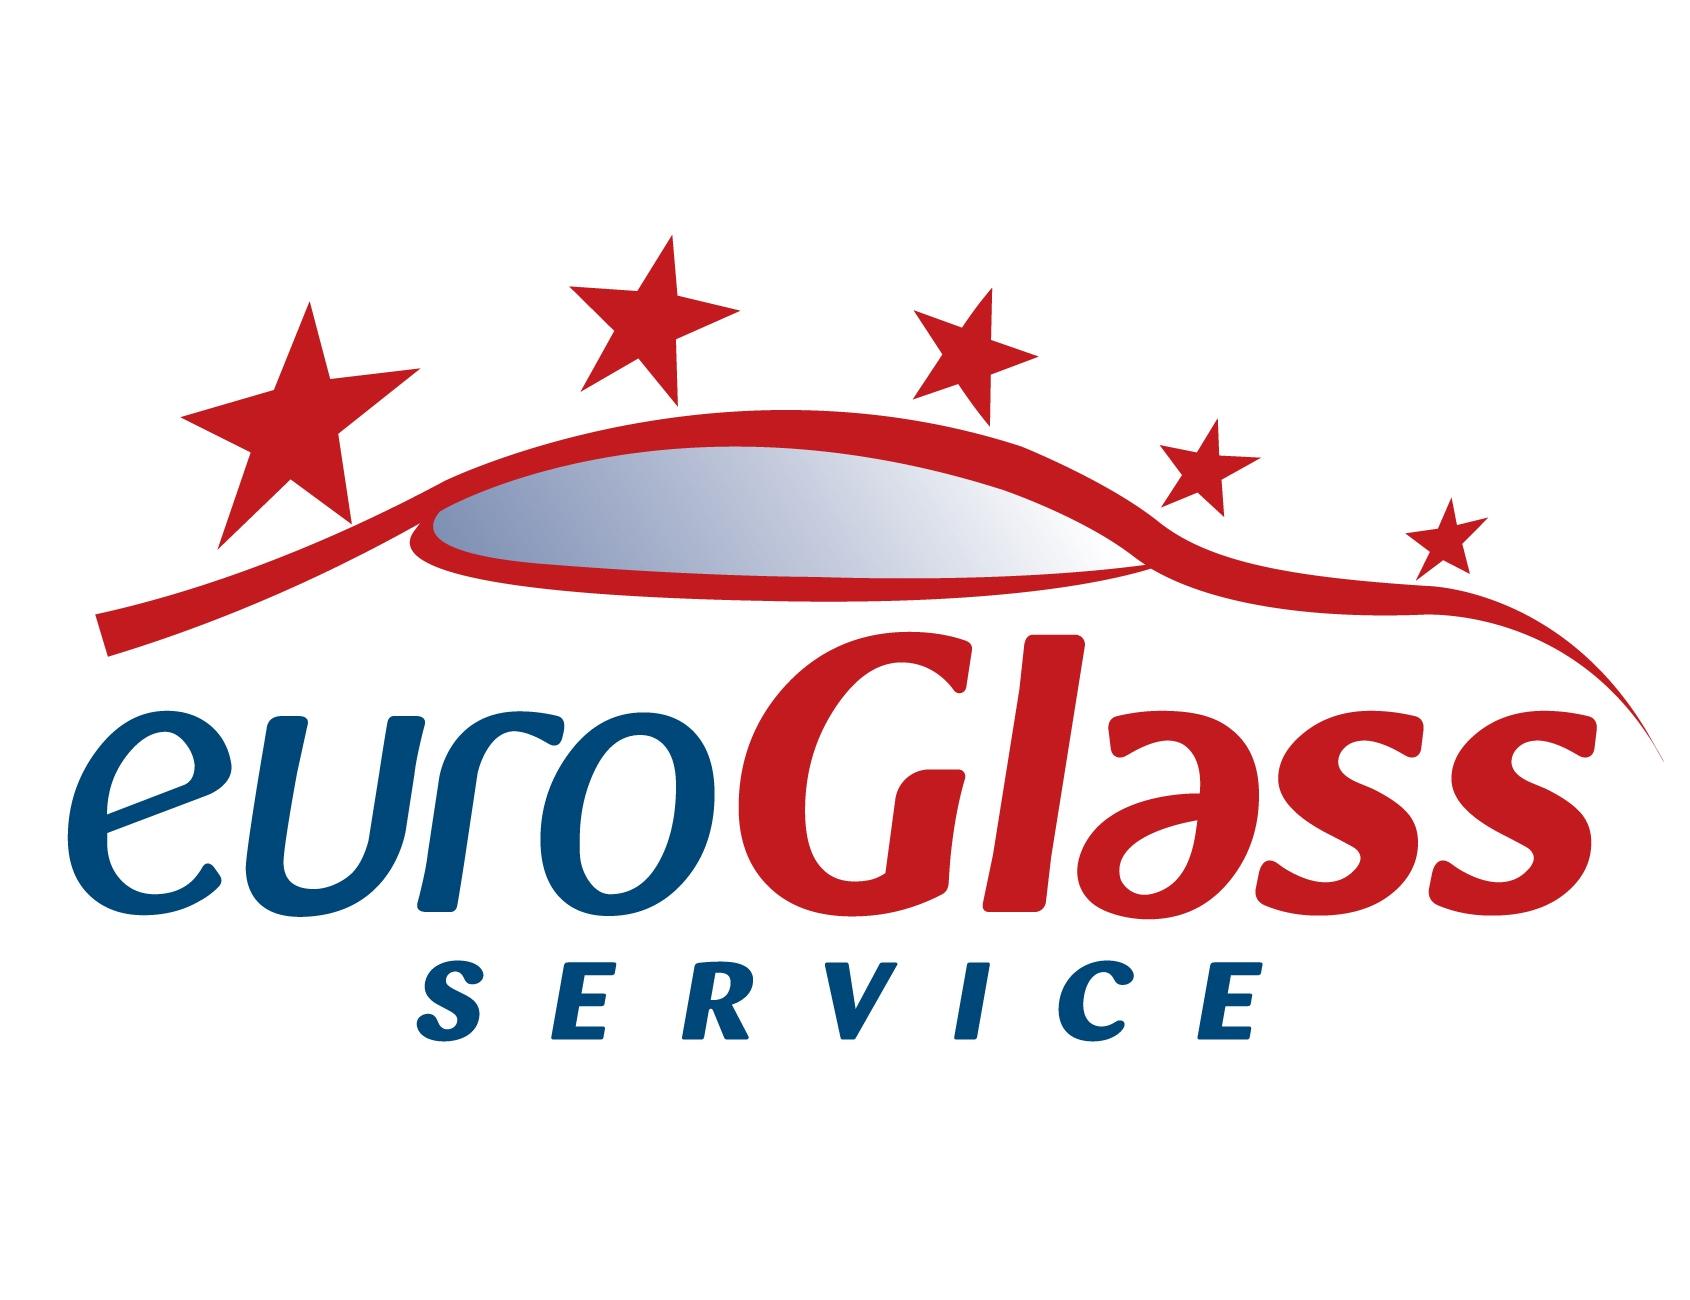 EuroGlass Service HiRes